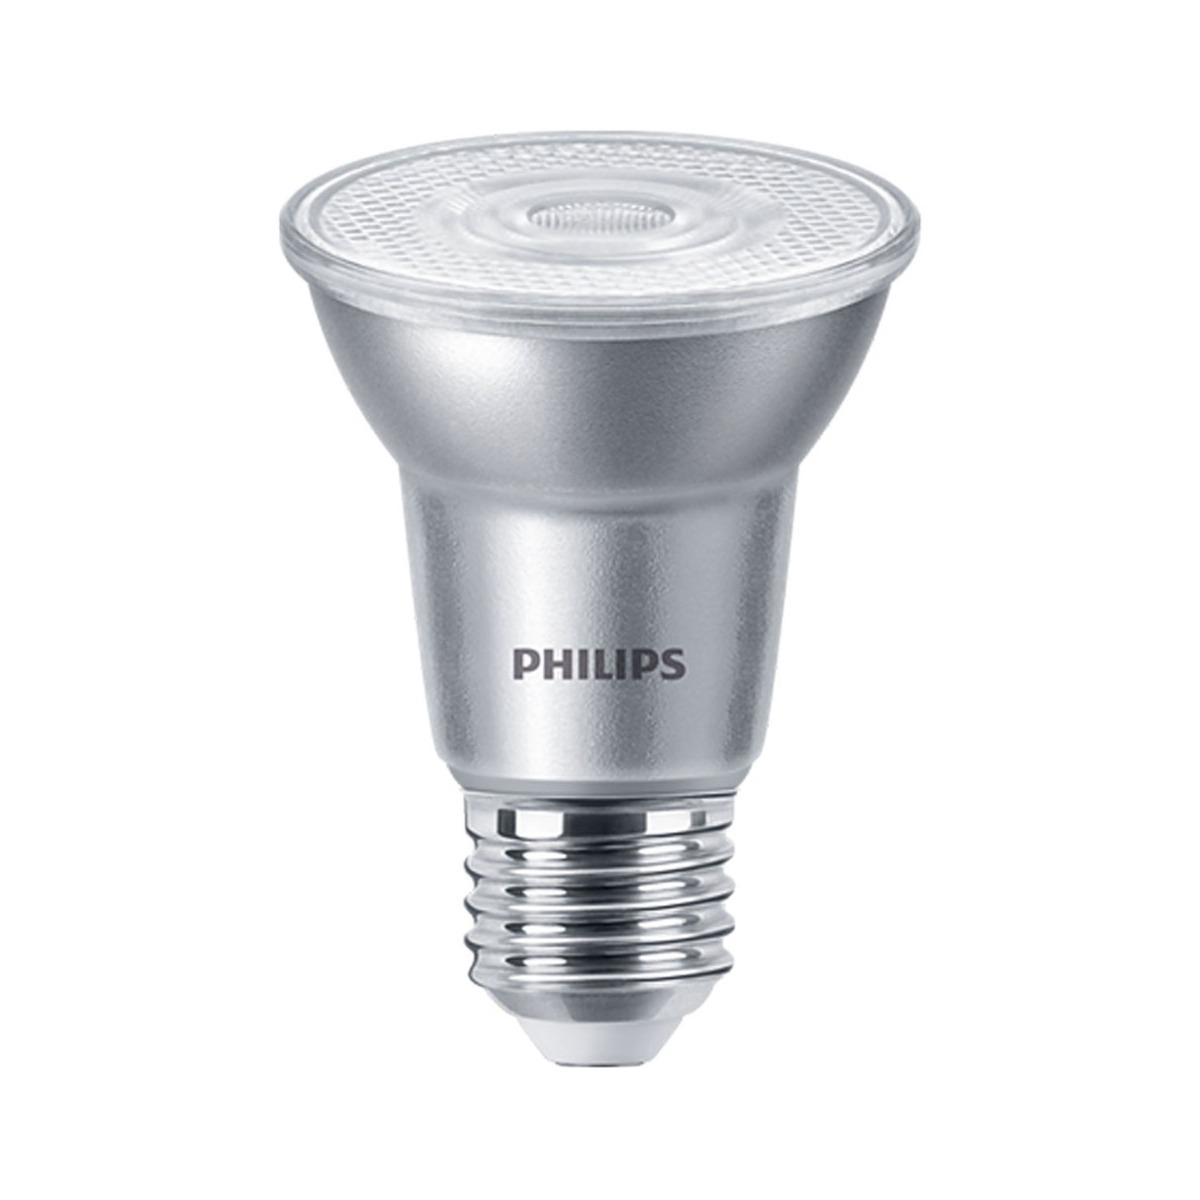 Philips LEDspot E27 PAR20 6W 830 25D 515lm (MASTER)   Dimbaar - Warm Wit - Vervangt 50W